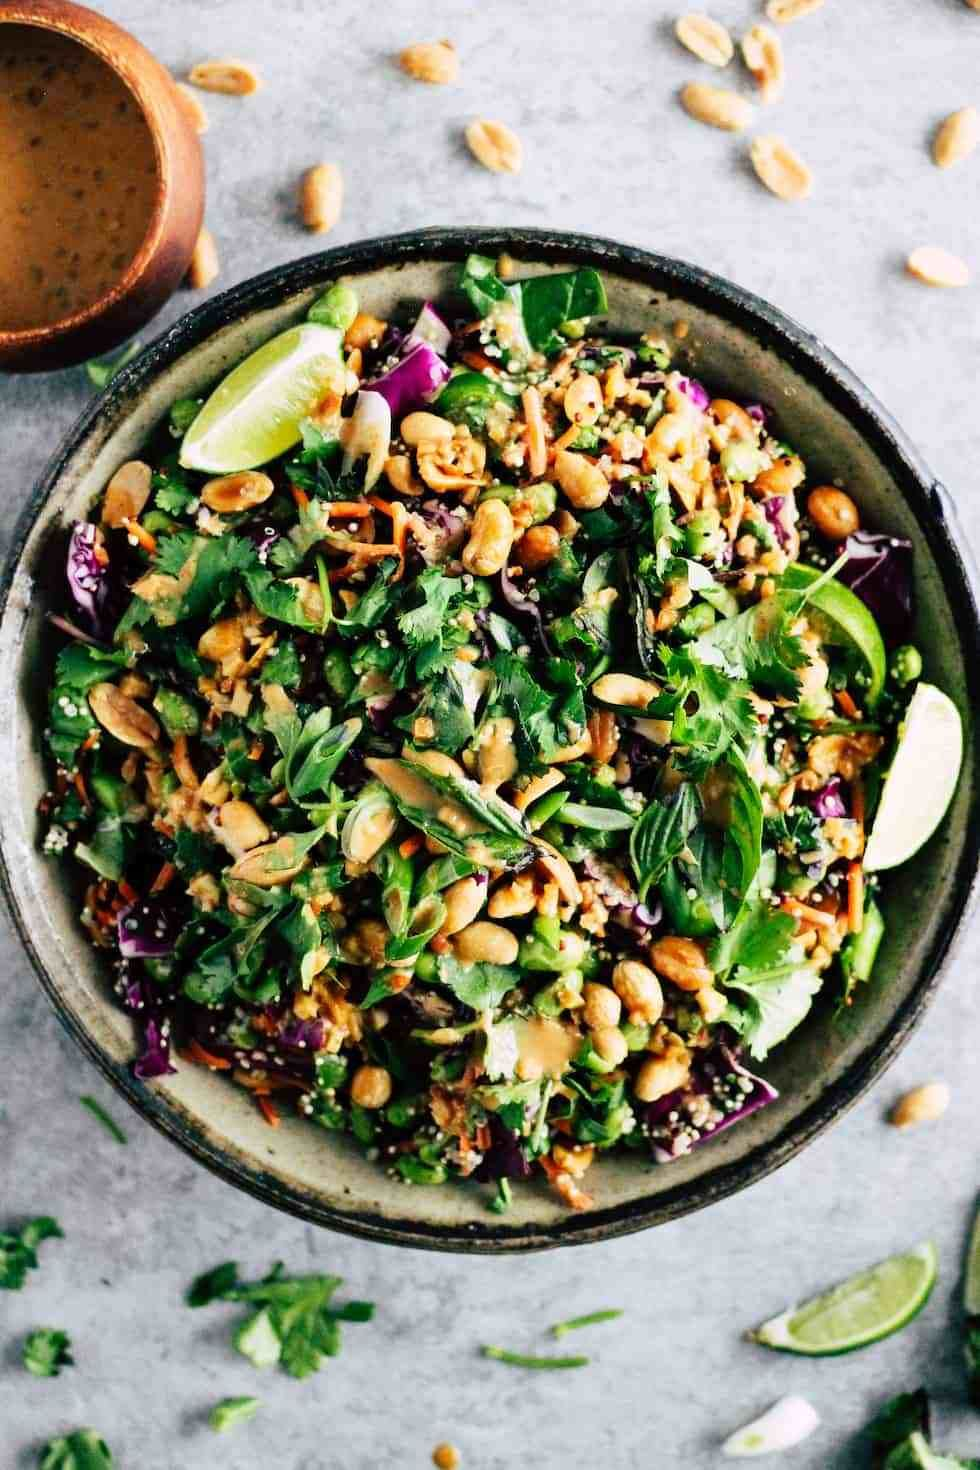 Spicy Edamame Crunch Salad Recipe Edamame Salad Edamame